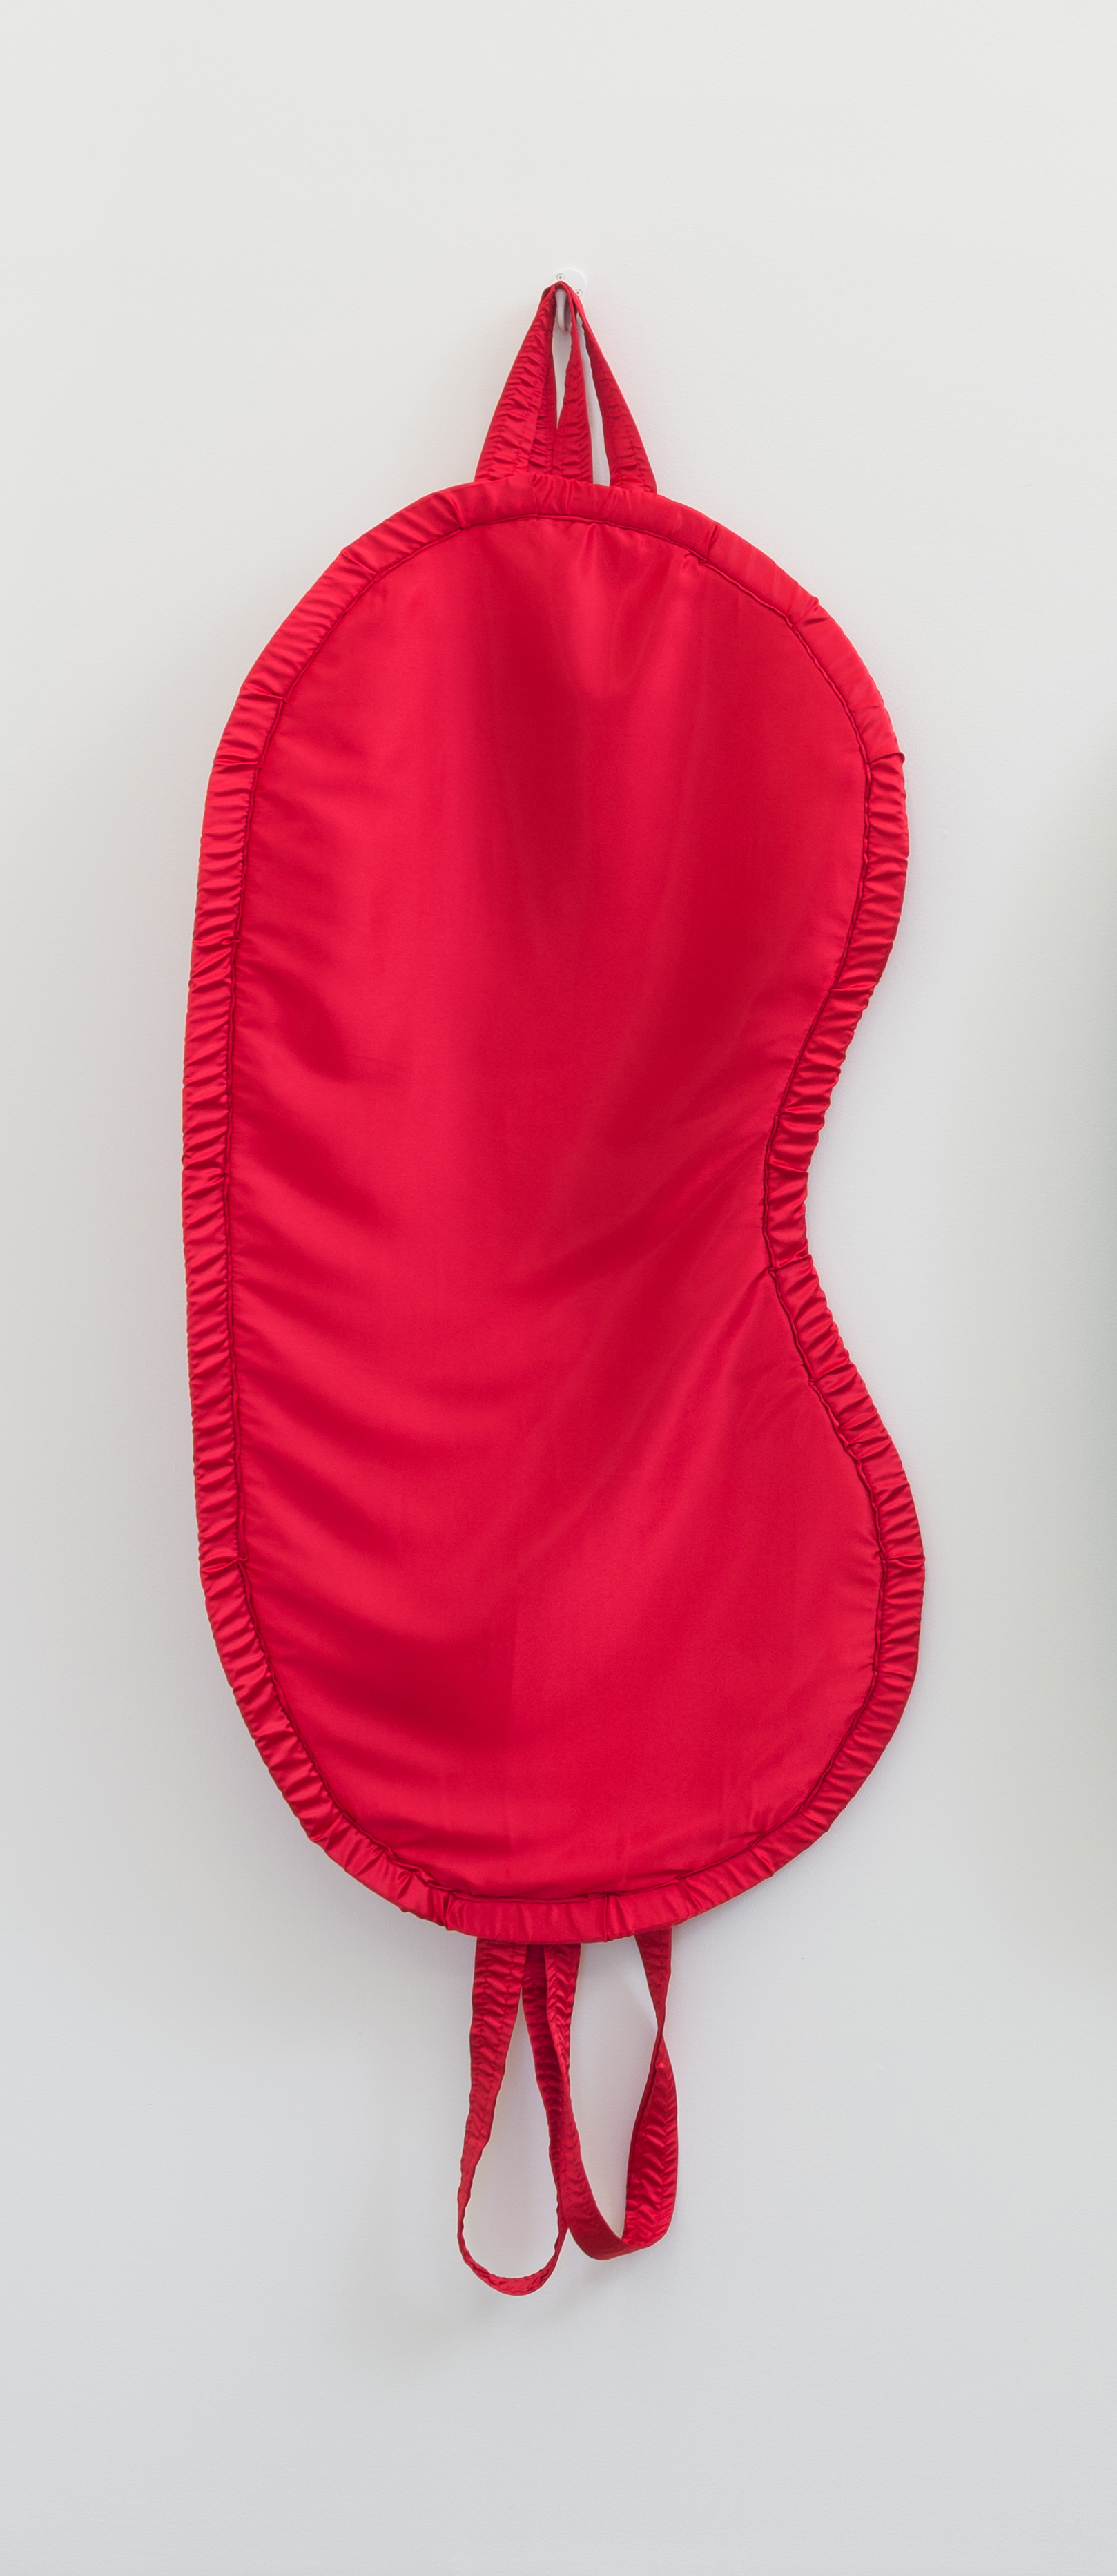 Amanda Ross-Ho, Untitled Apparatus (RED), 2017 satin, foam, elastic, thread 190 x 71 x 5 cm - 74 3/4 x 28 x 2 inches